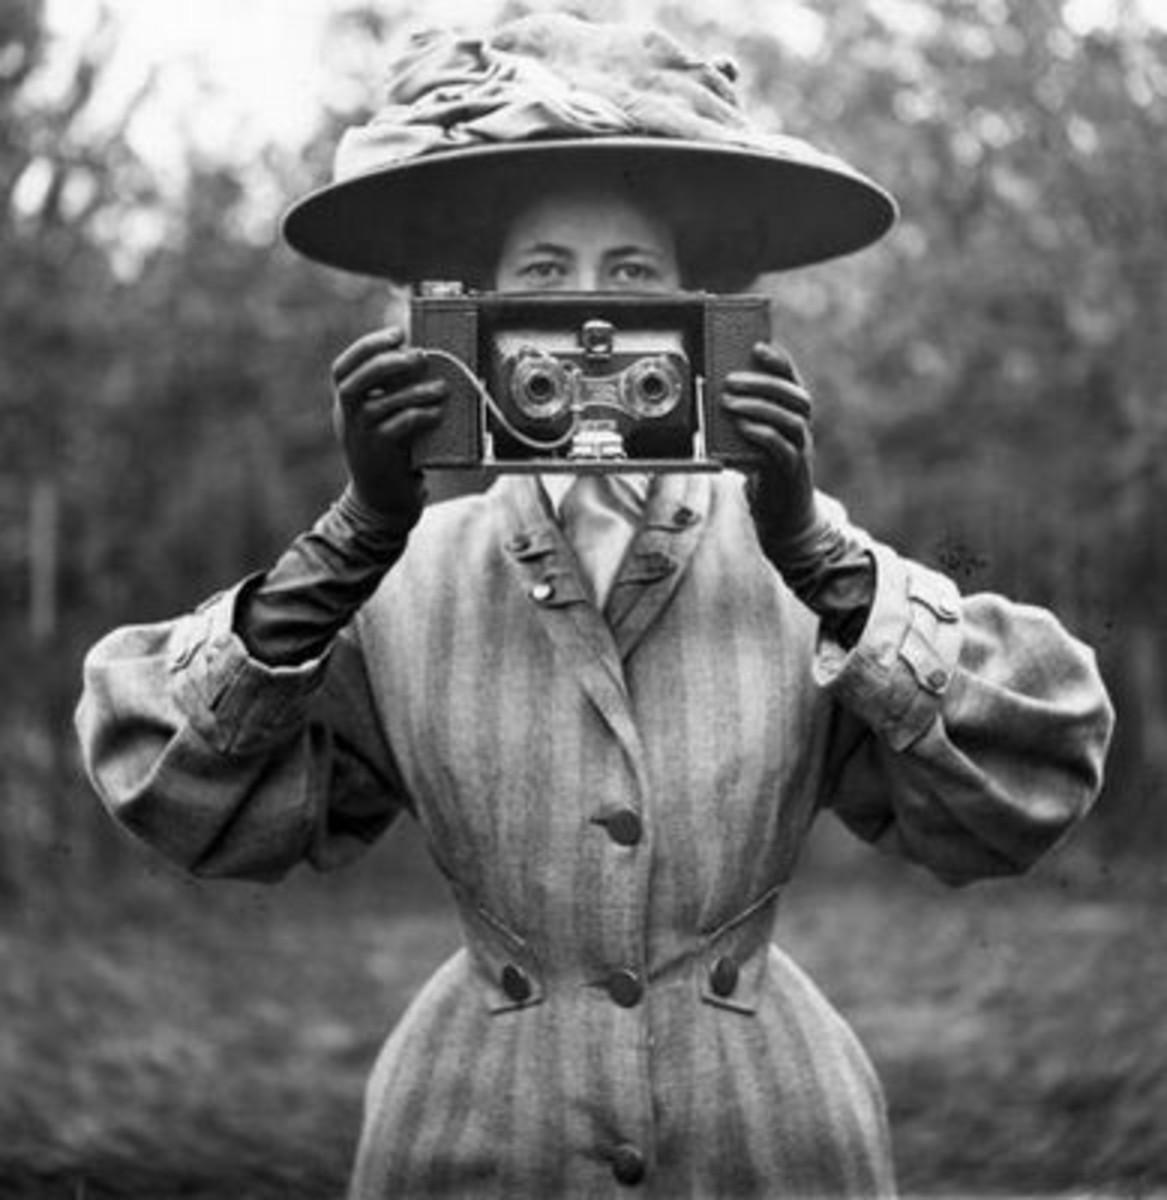 vintagephotographer